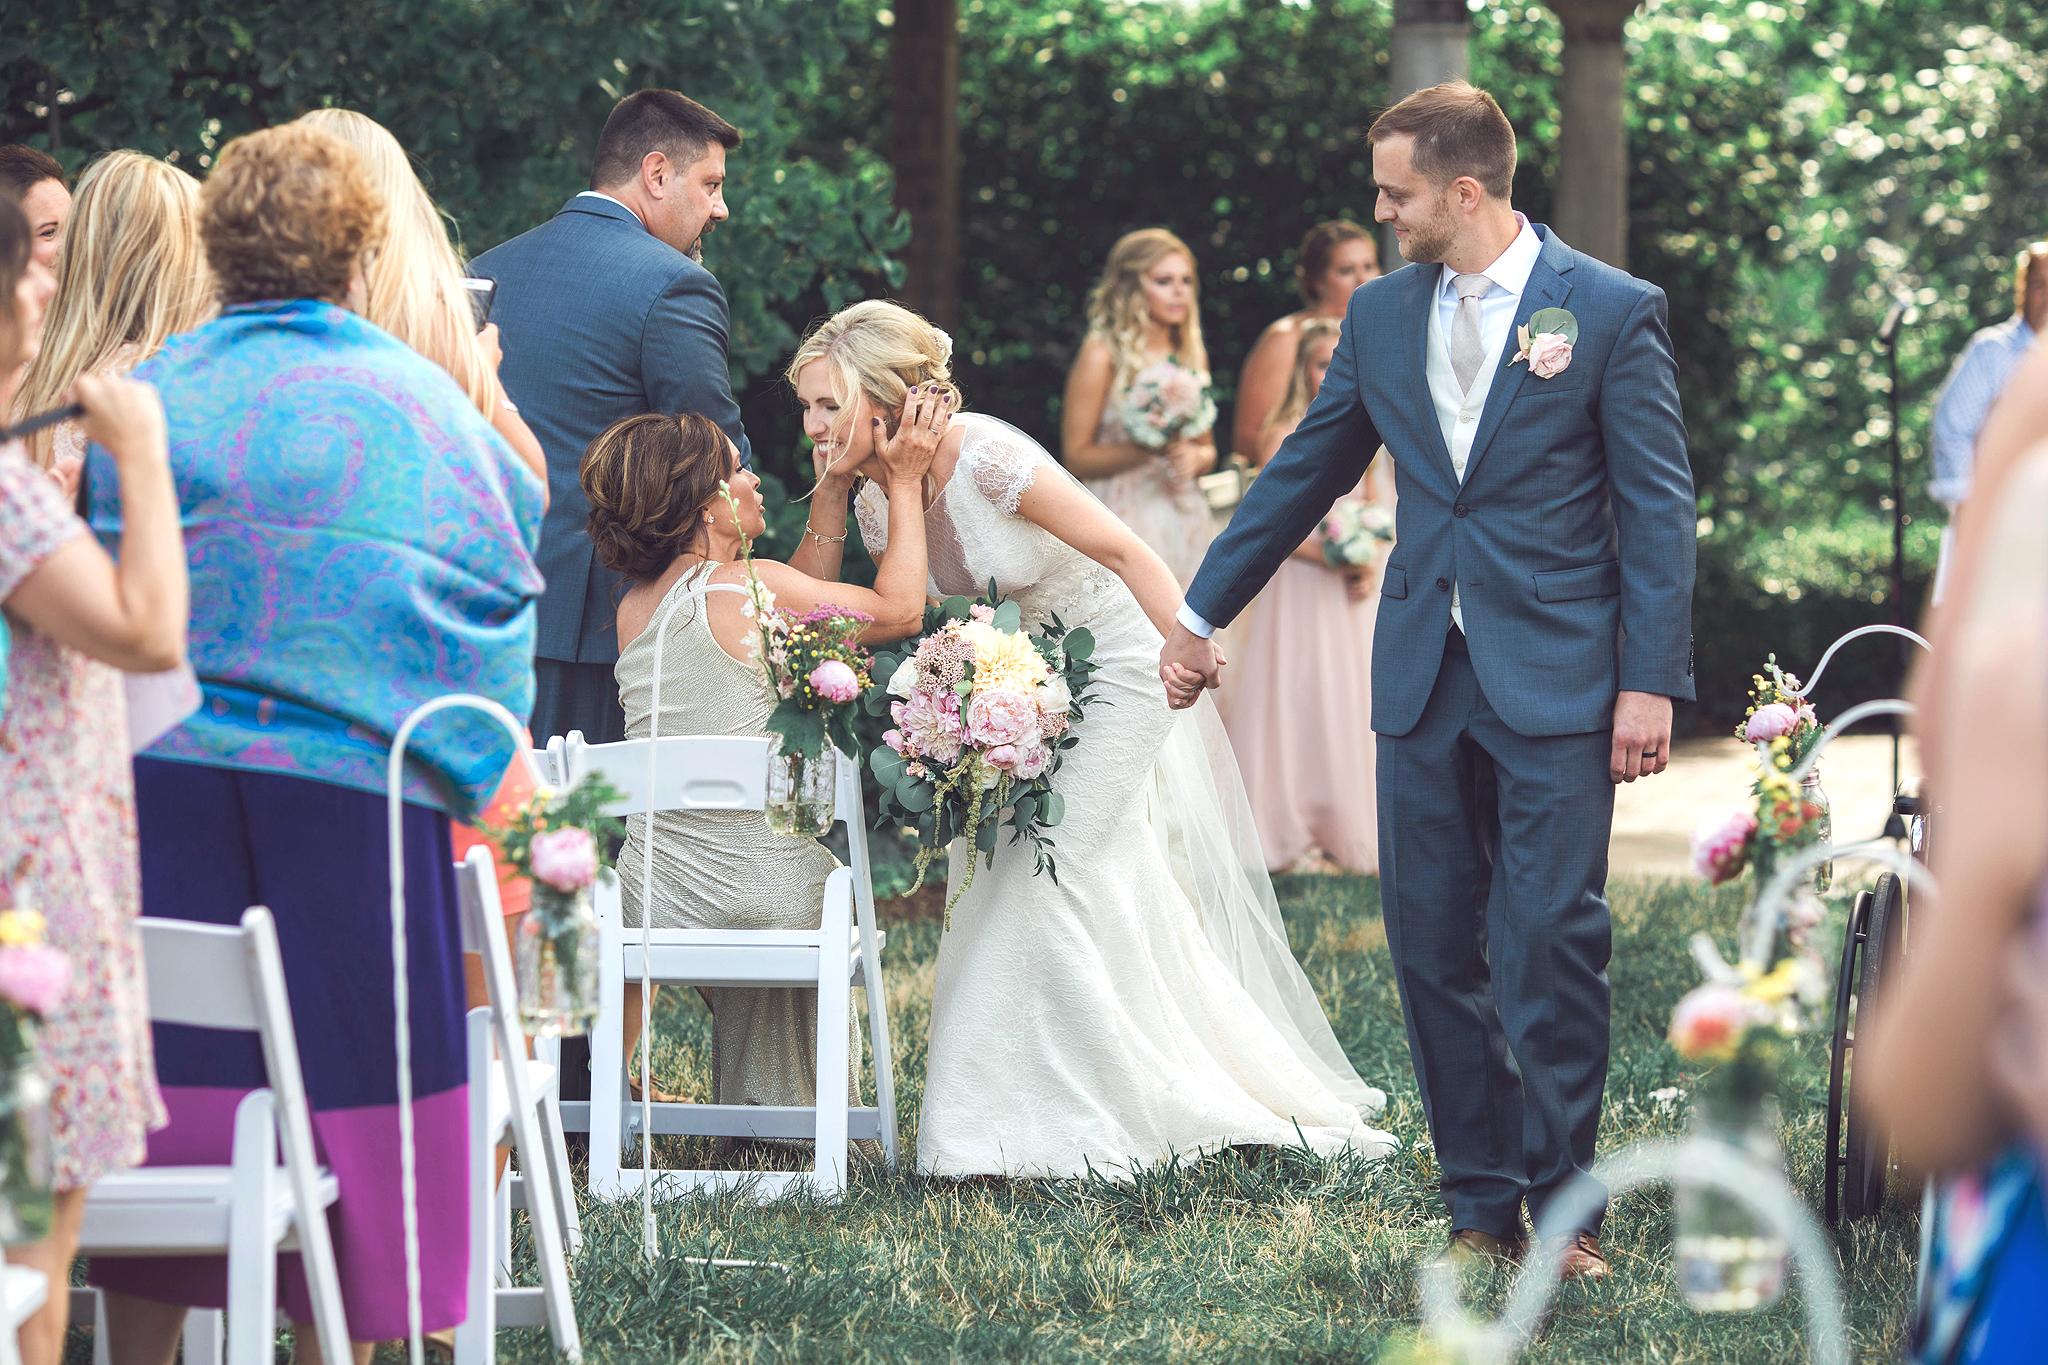 Cincinnati-Dayton-OH-Traveling-Wedding-Photographer-Rhinegeist-Brewery-Ault-Park-21C-112.jpg